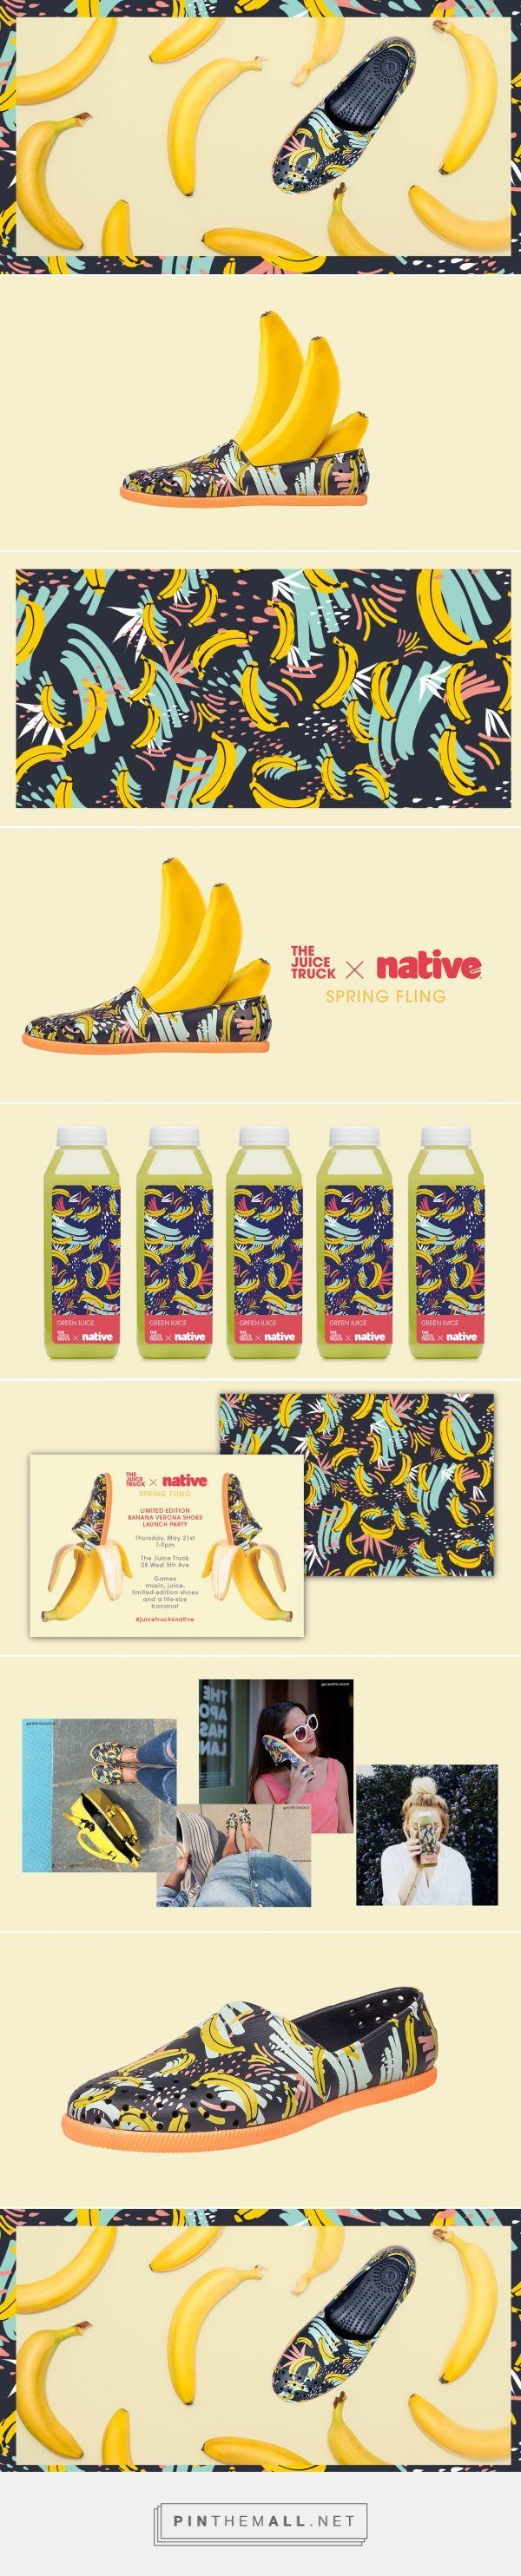 Juice Truck x Native Shoes Branding by Glasfurd & Walker Design